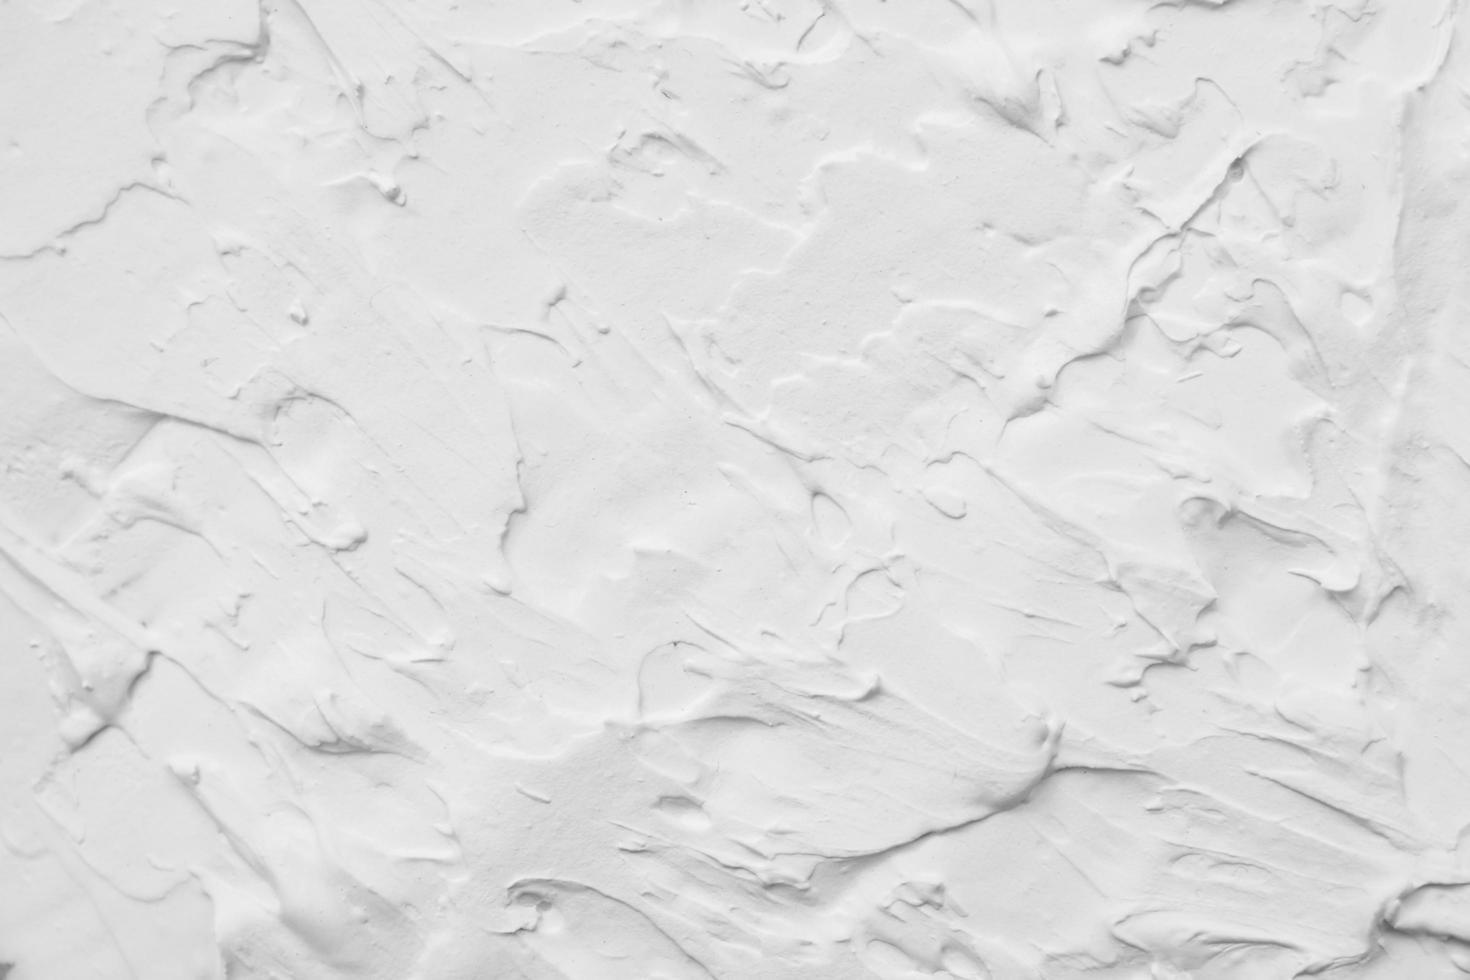 béton blanc grunge photo